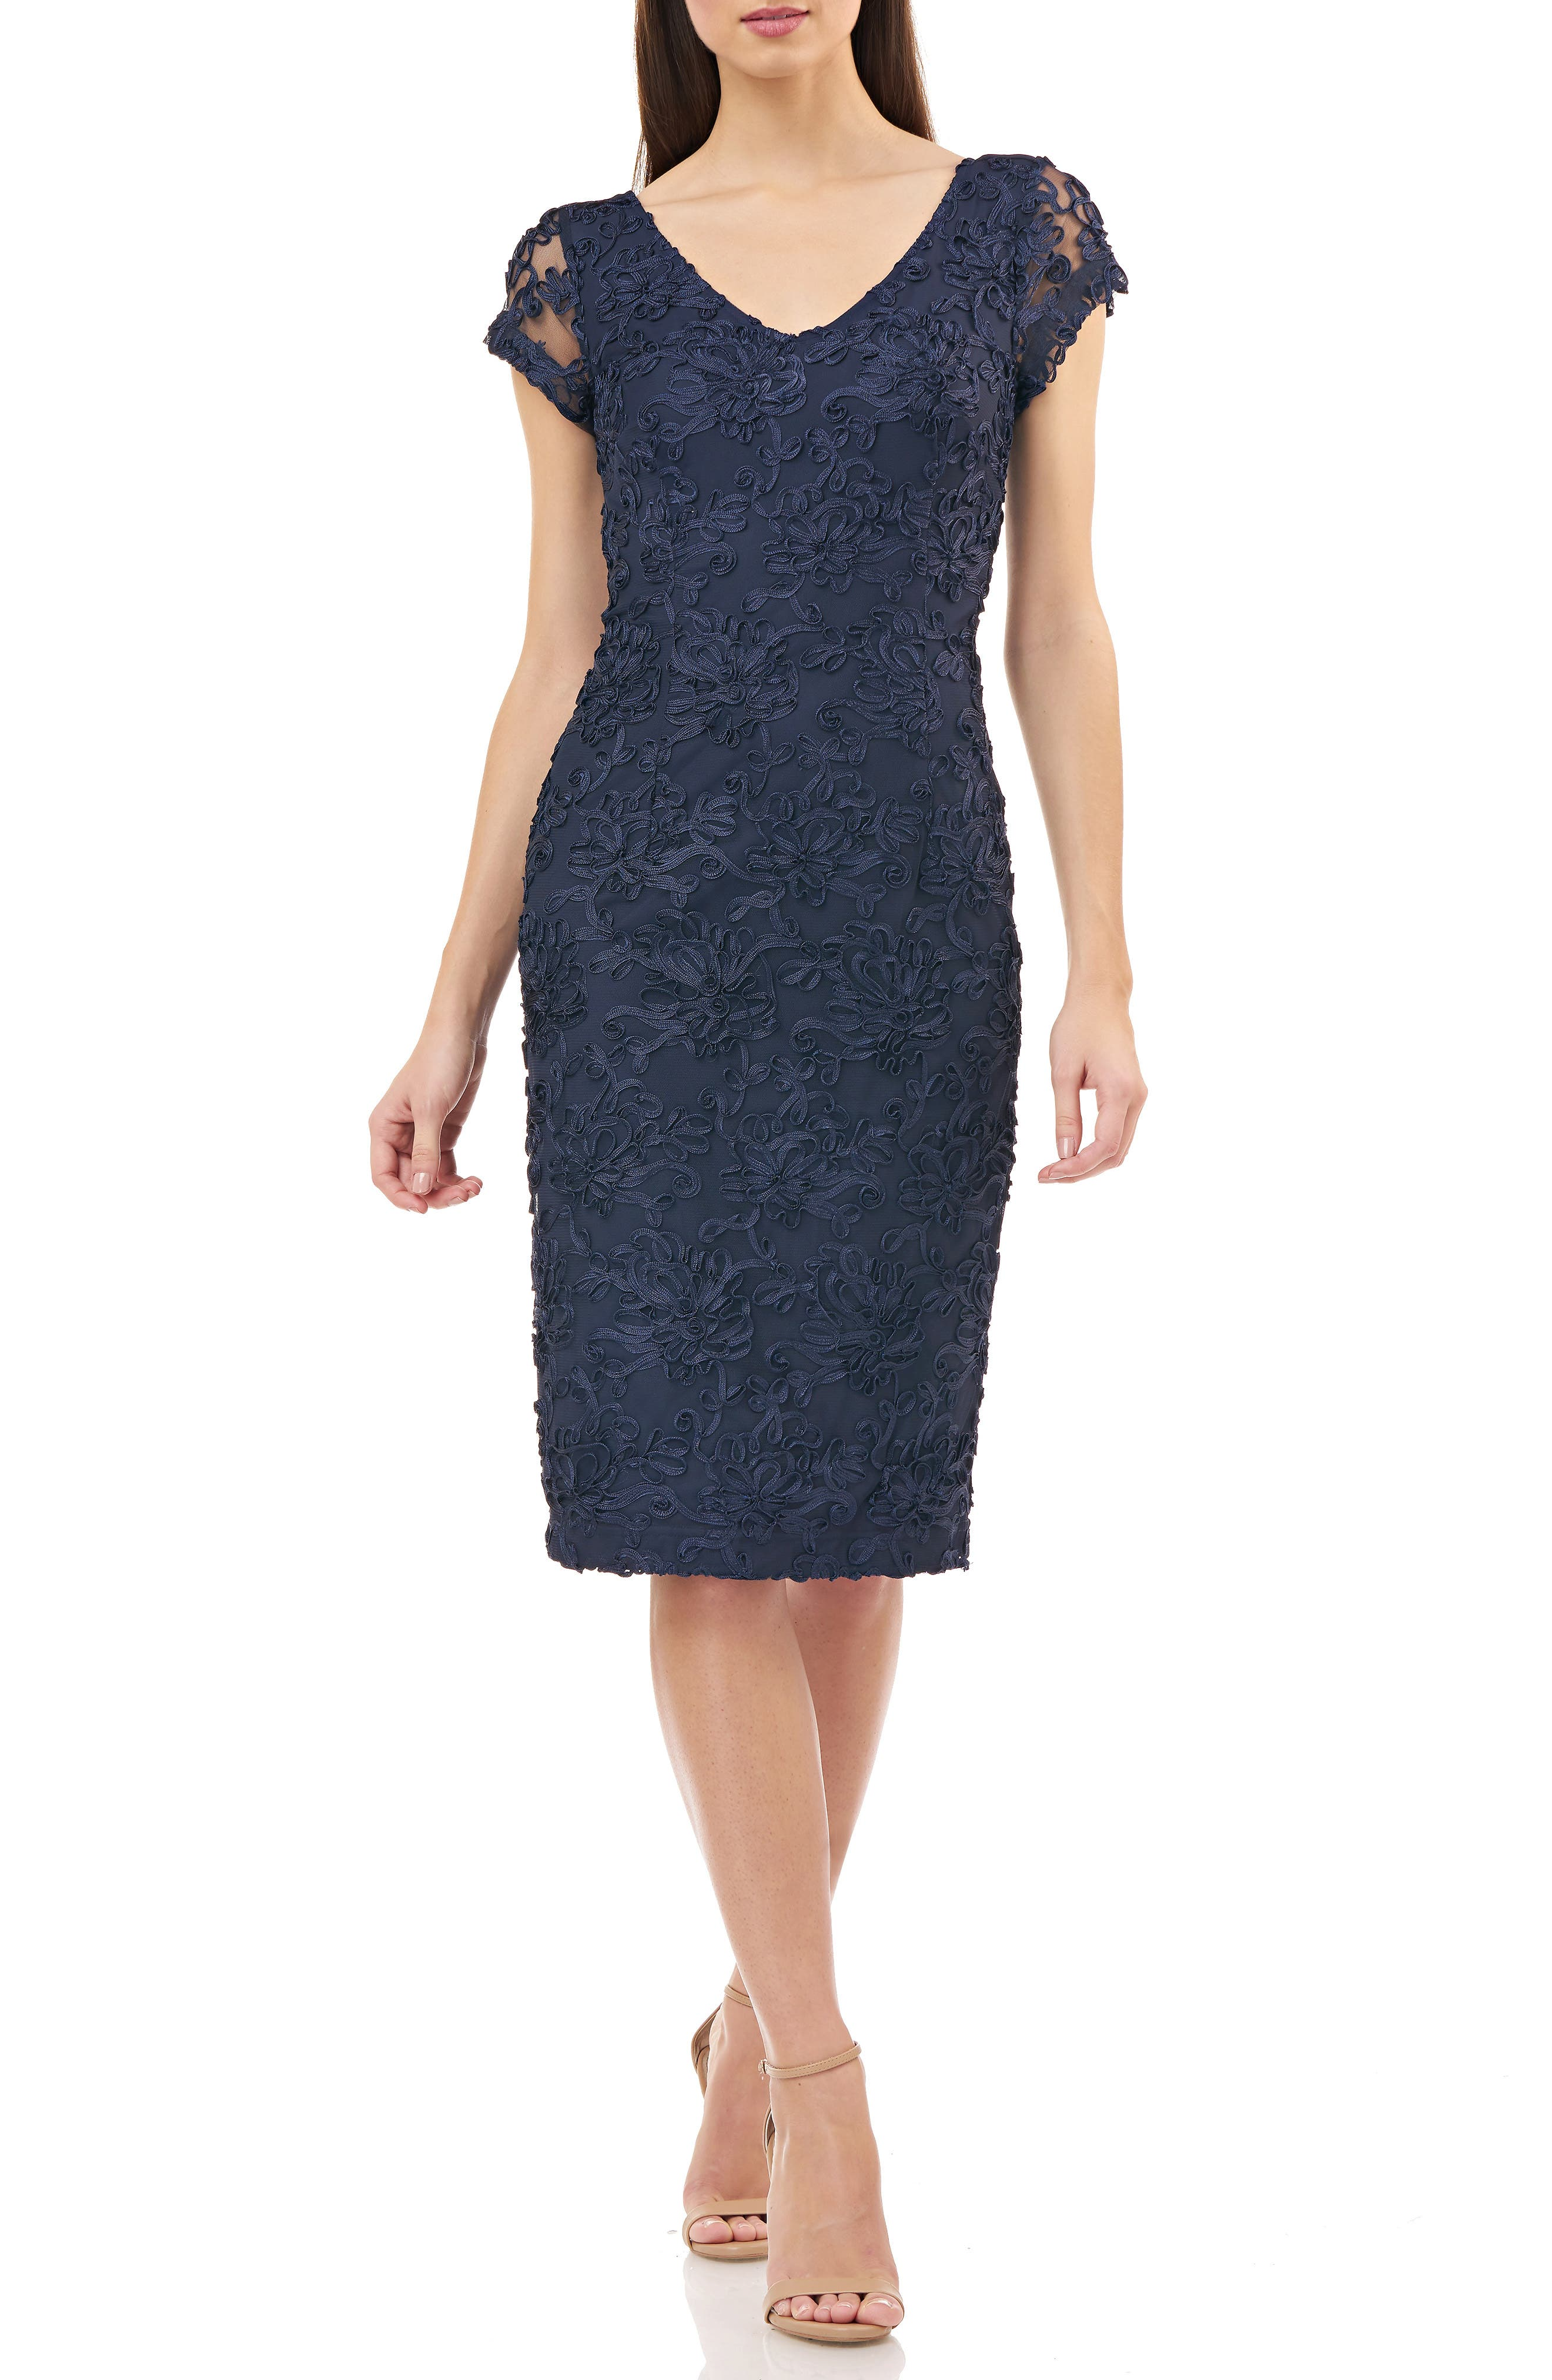 Js Collections Soutache Embroidered V-Neck Cocktail Dress, Blue